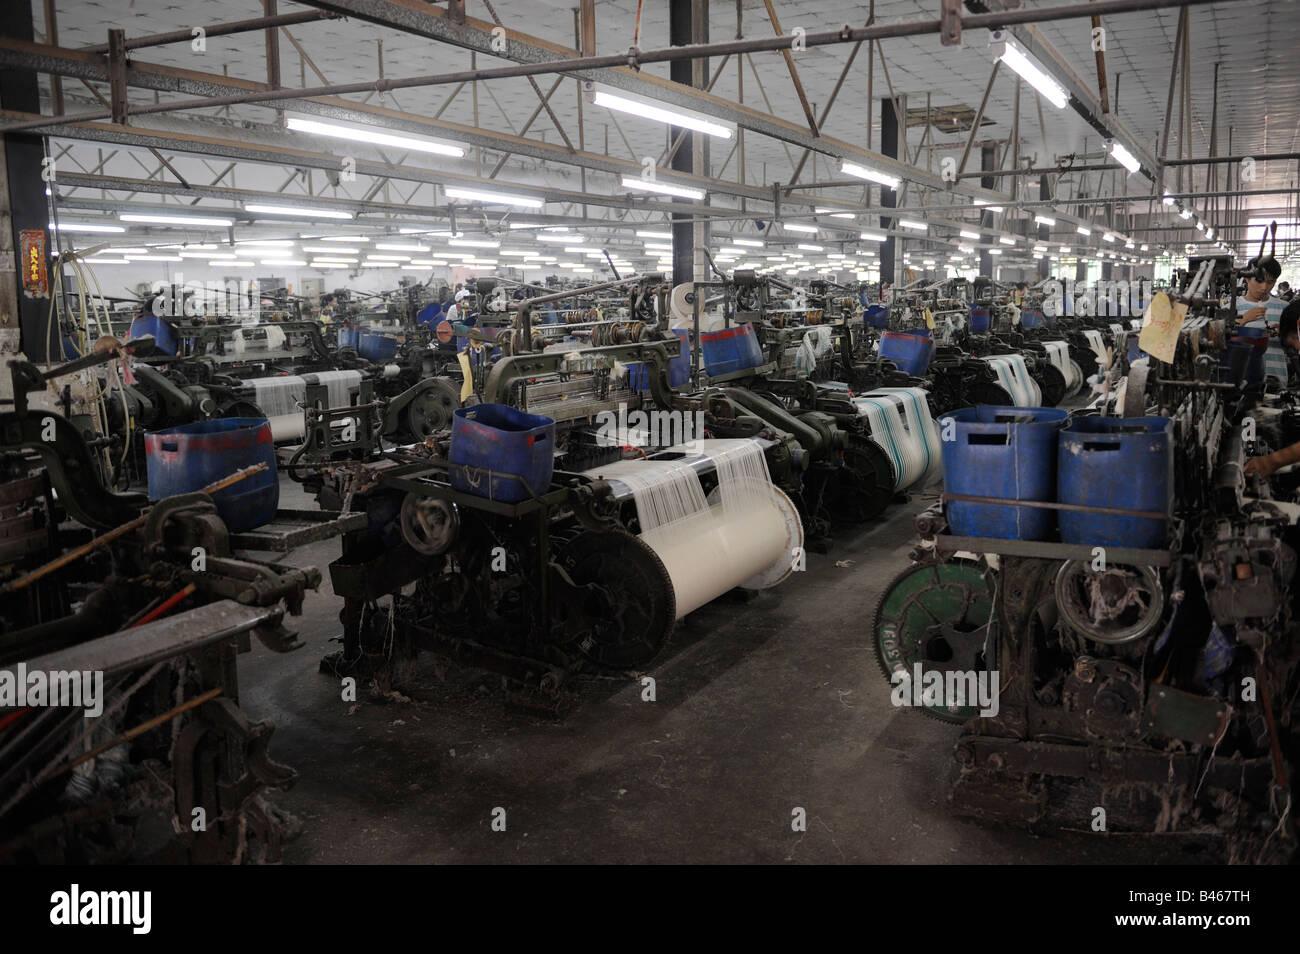 Una fabbrica tessile in Dongguan, Guangdong, Cina. 19-set-2008 Immagini Stock